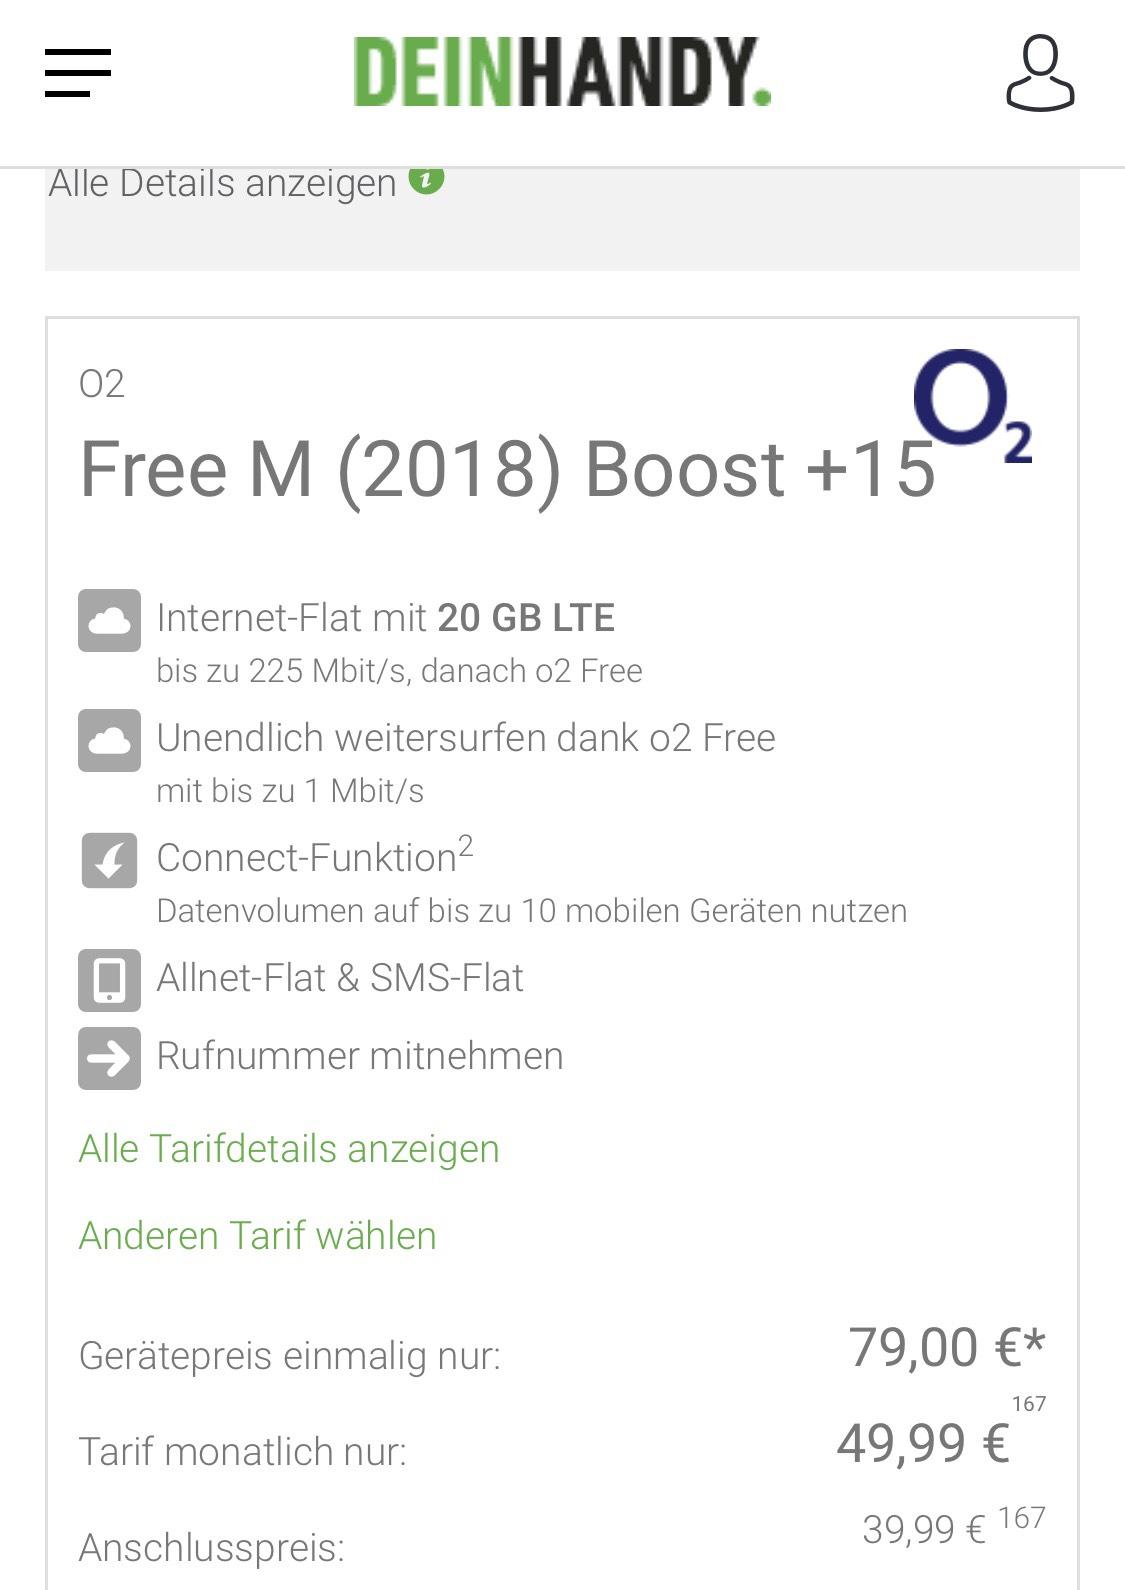 iPhone XS 64GB mit O2 Free M Boost + 15